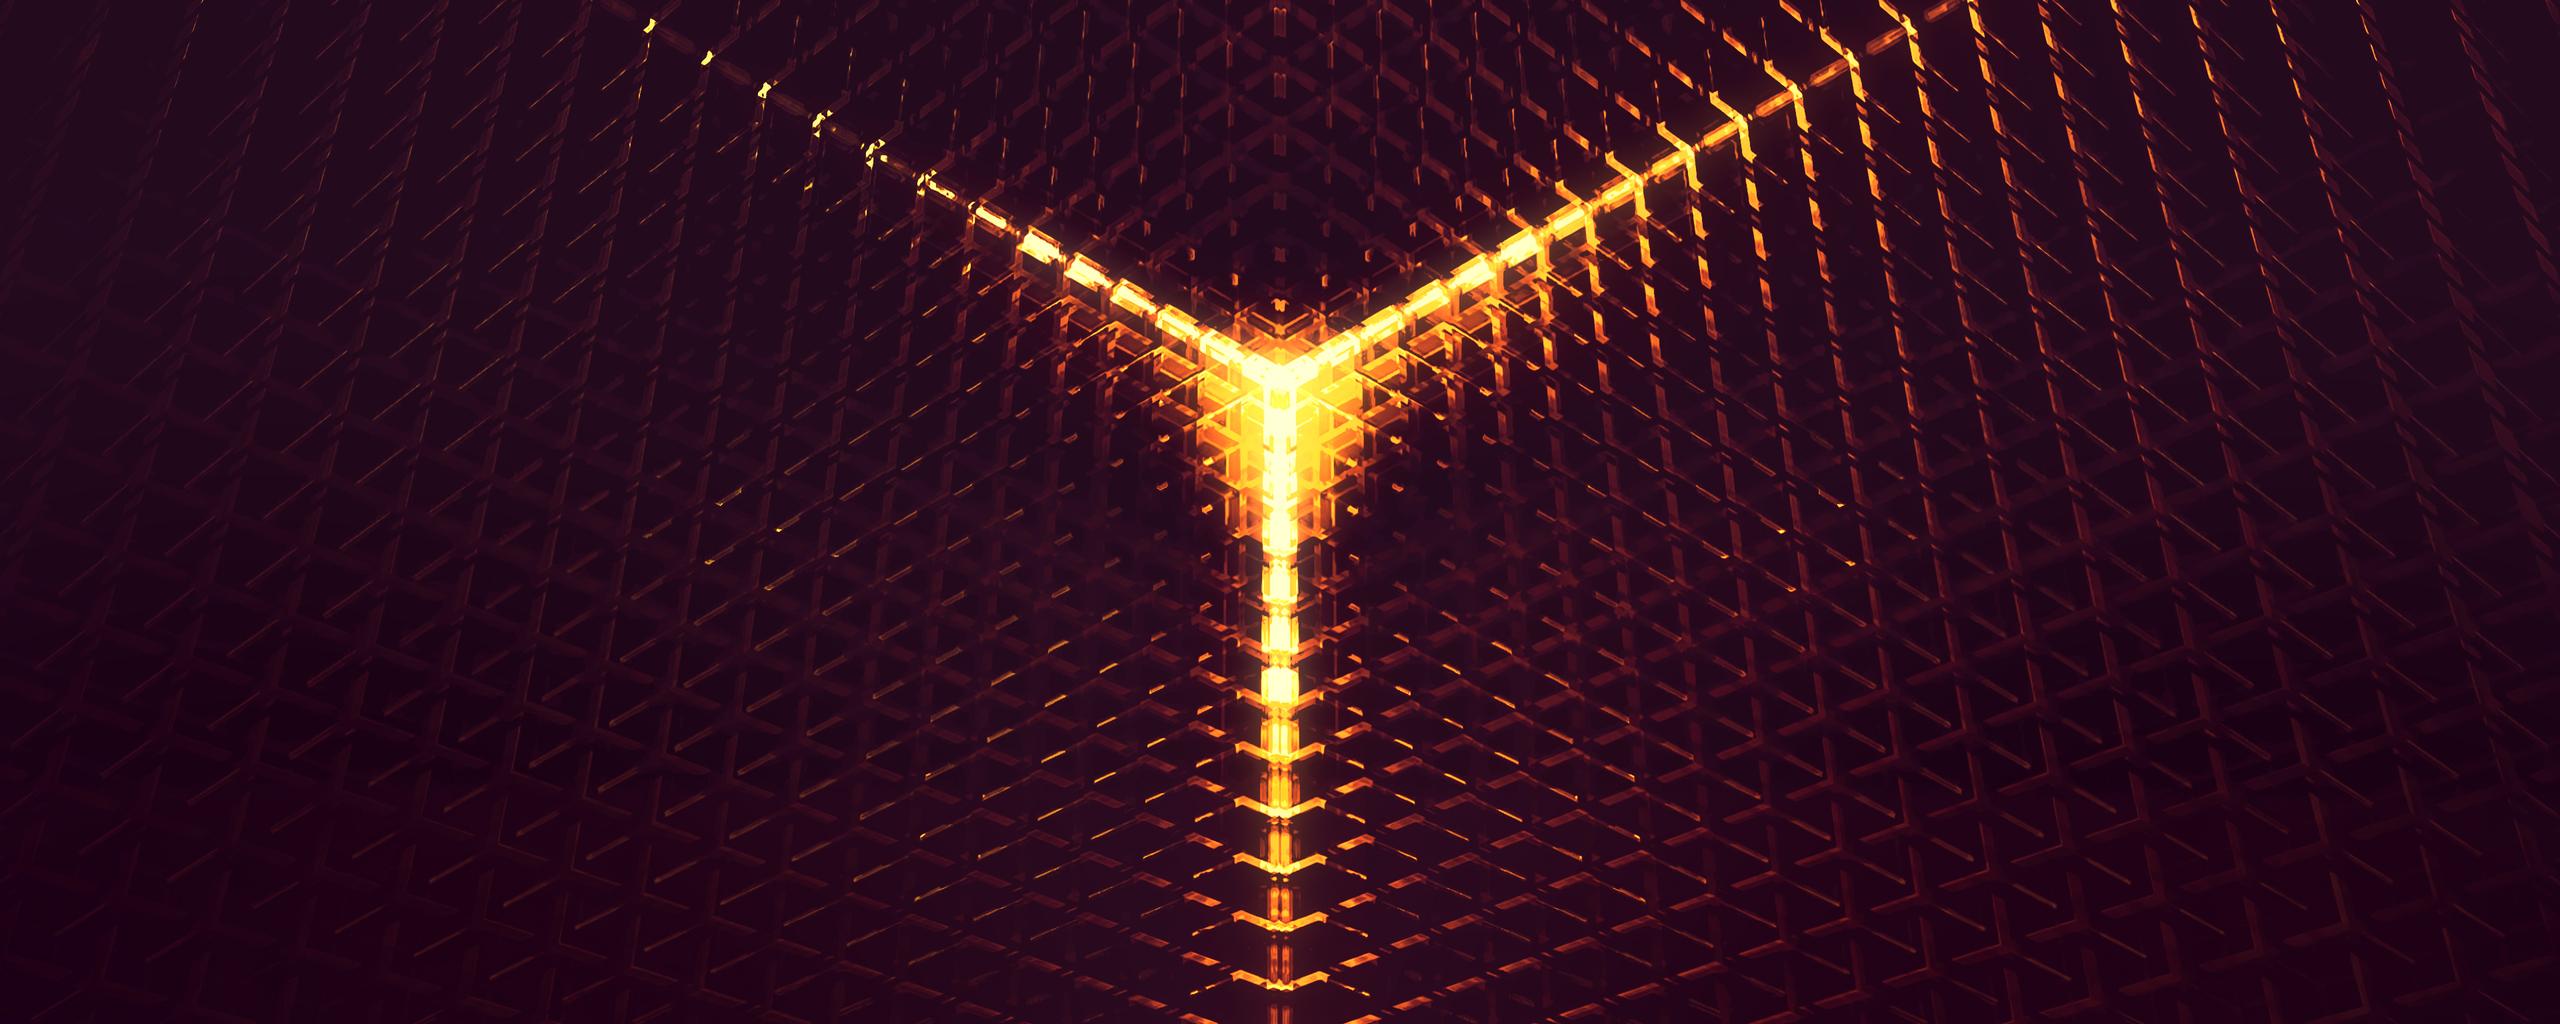 3d-abstract-digital-art-orange-light-4k-oo.jpg